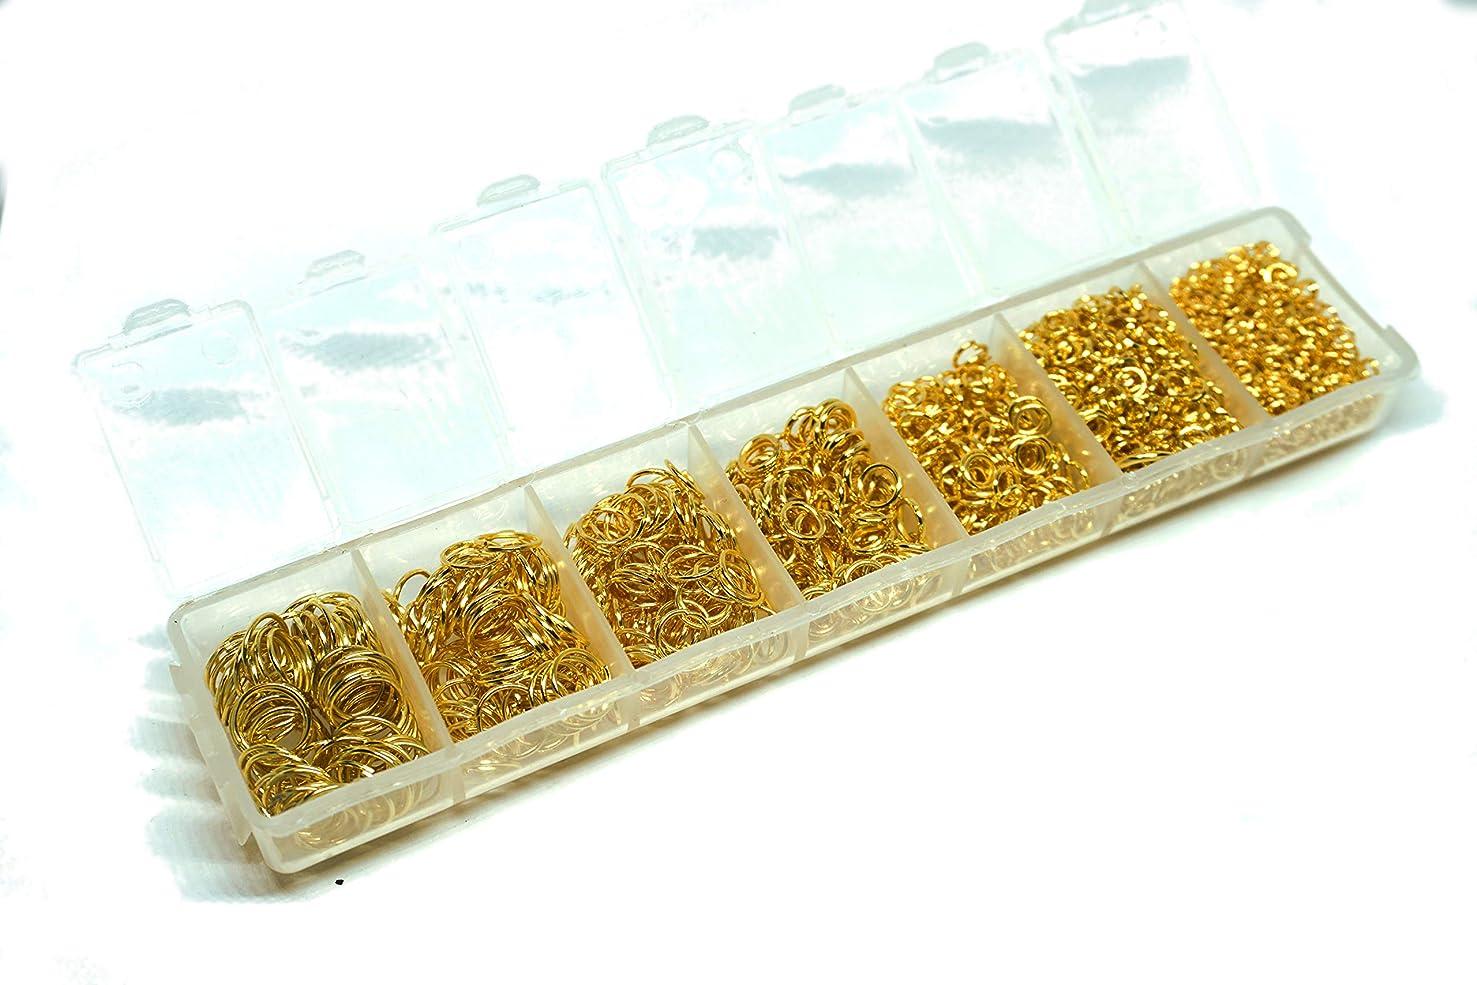 HDSupplies 1760pcs Gold Tone Open Jump Rings Assorted Sizes 3mm 4mm 5mm 6mm 7mm 8mm 9mm